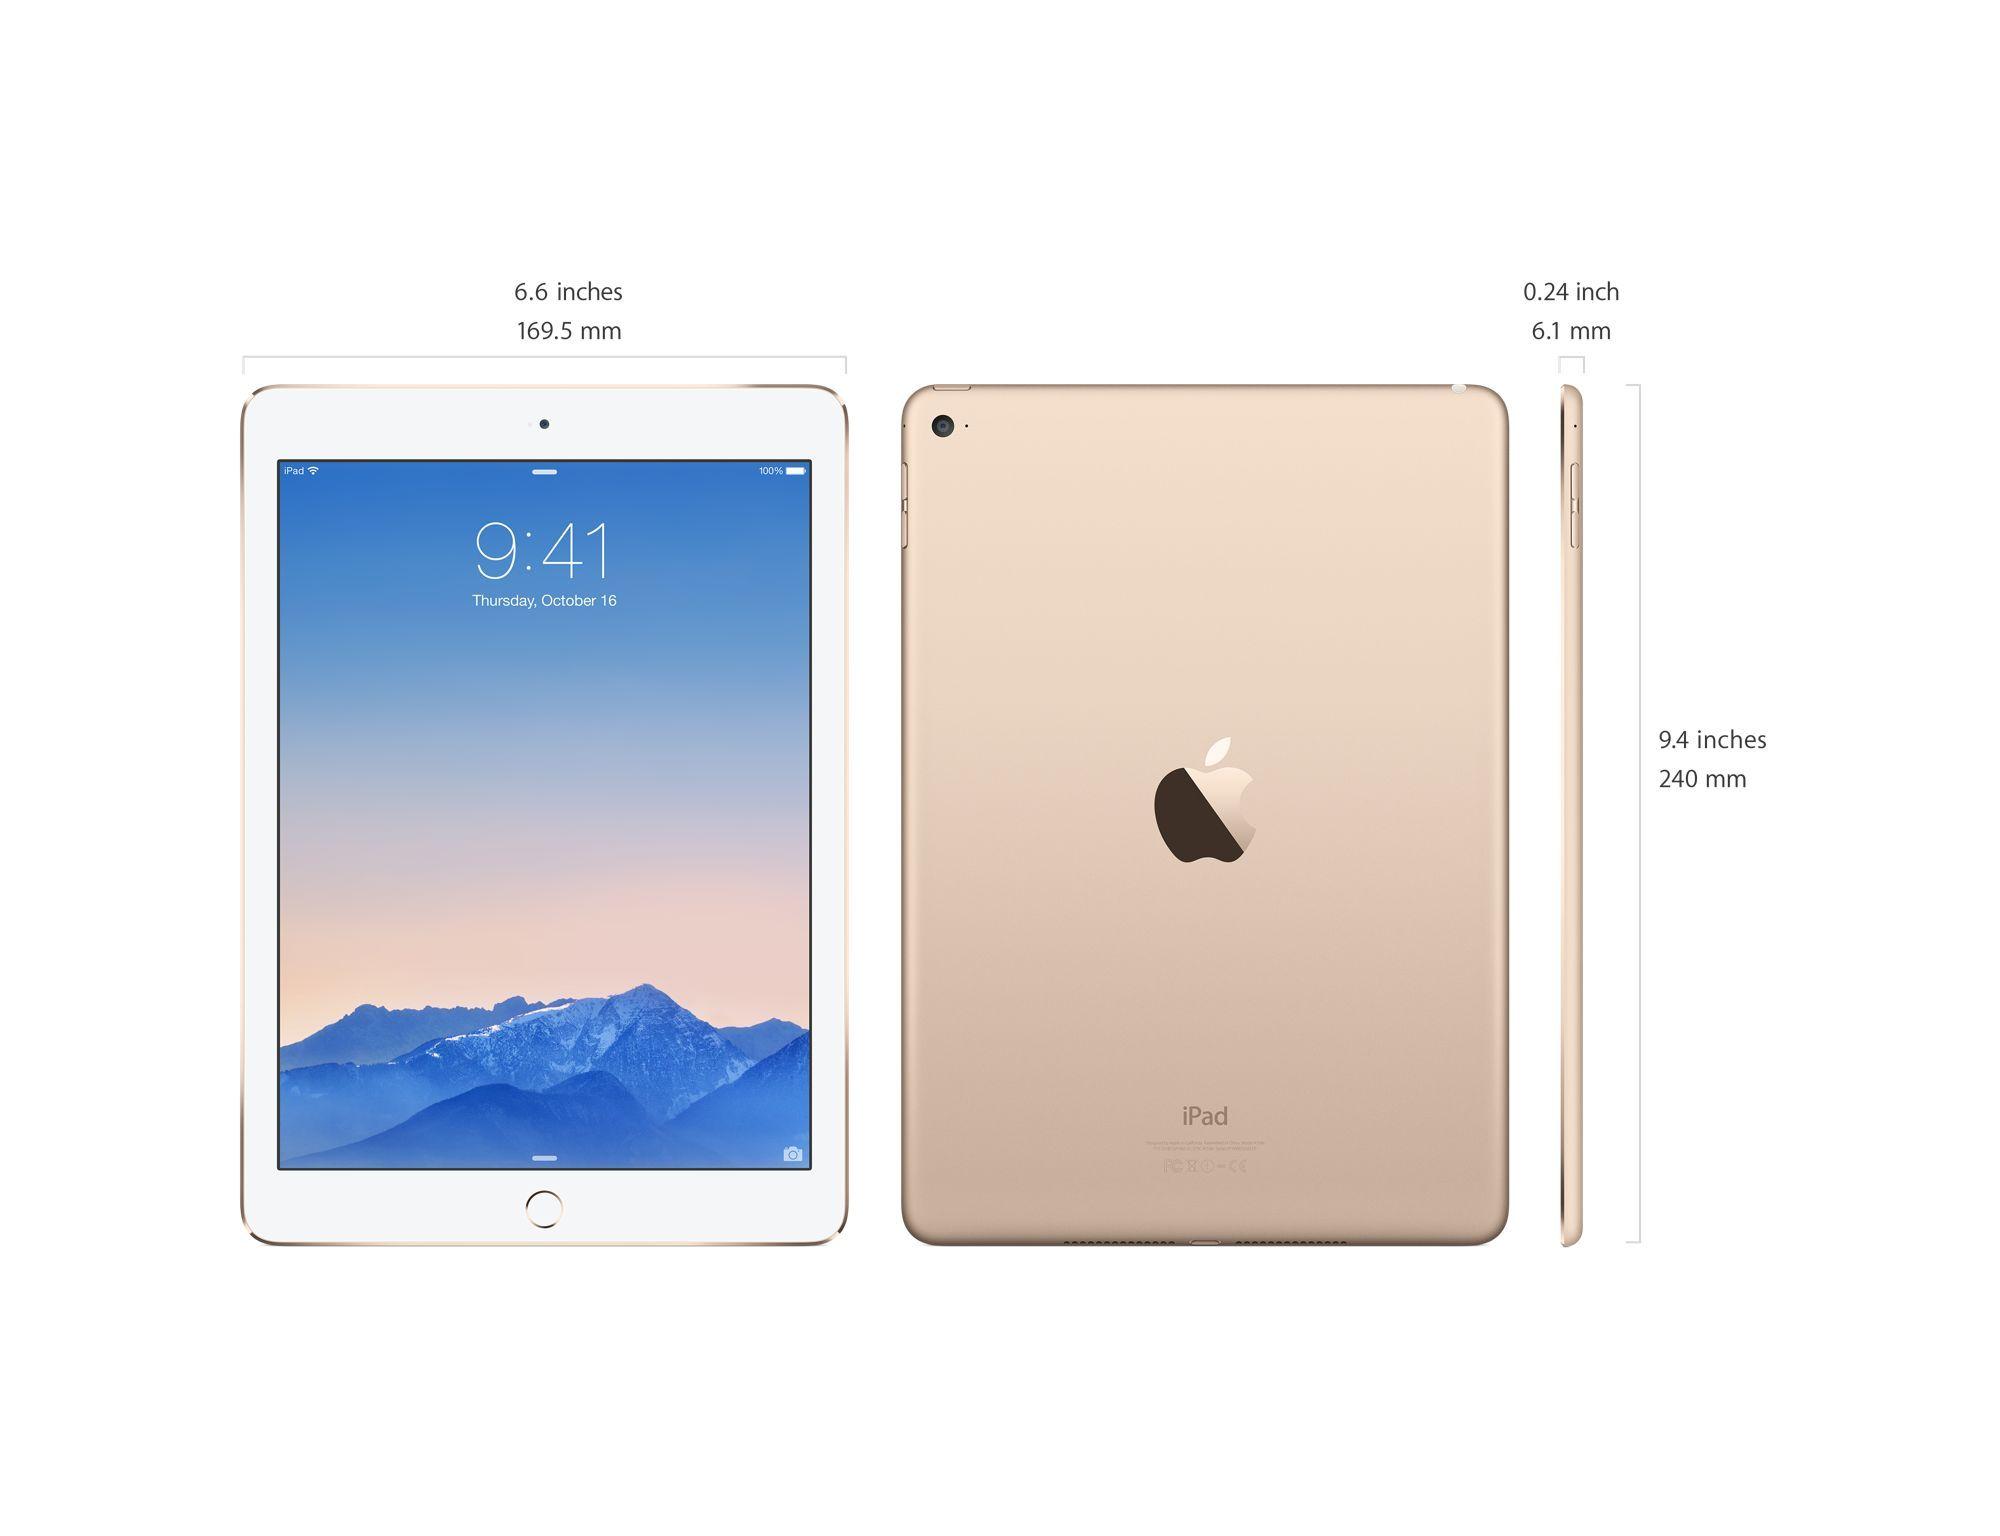 Apple Ipad Air 2 And Ipad Mini 3 Available For Pre Order In India Apple Ipad Air Ipad Ipad Air